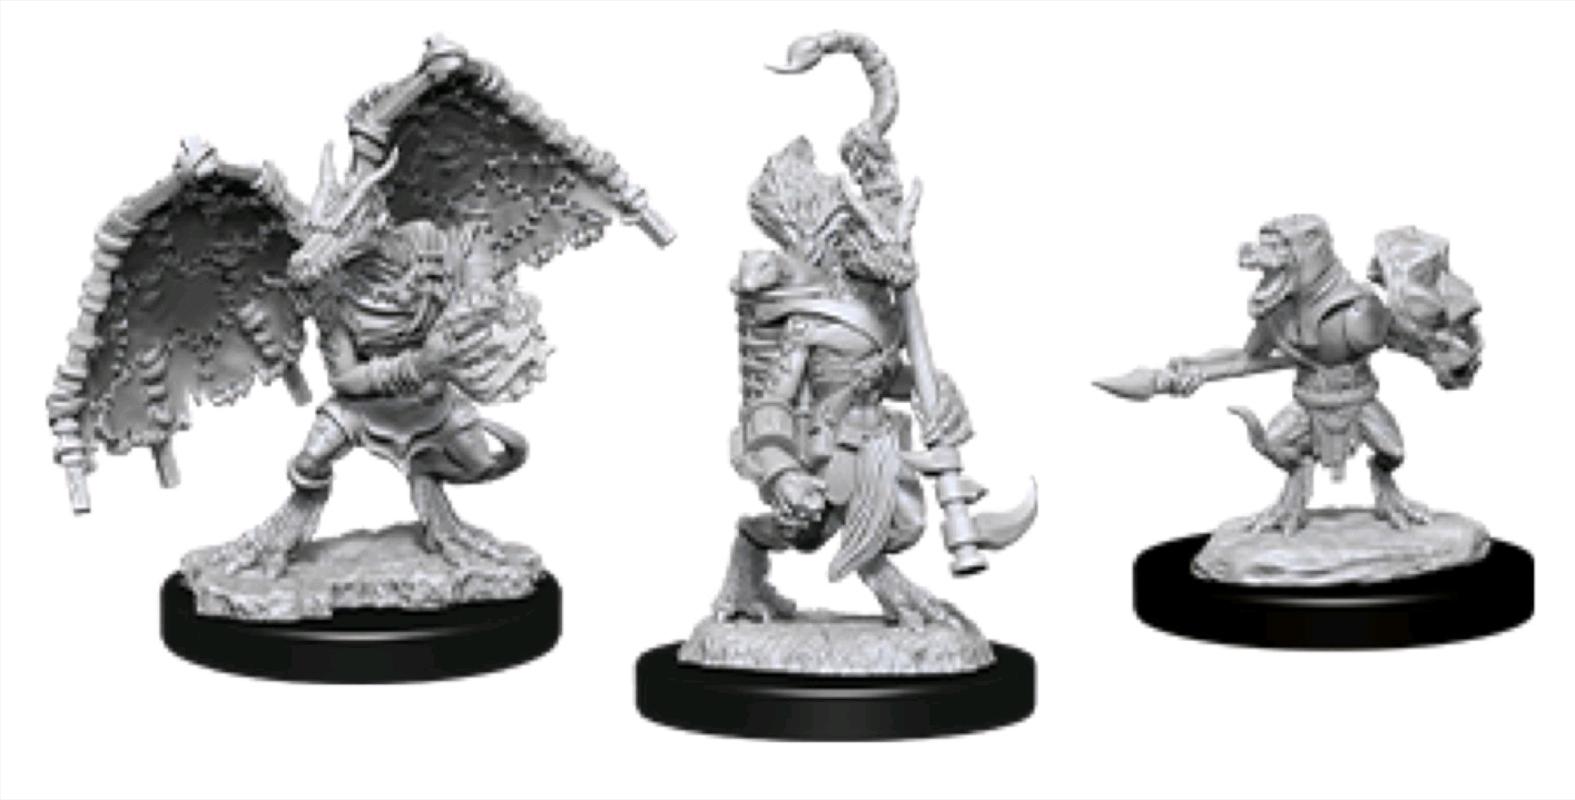 Dungeons & Dragons - Nolzur's Marvelous Unpainted Mini: Kobold Inventor, Dragonshield & Sorcerer | Games